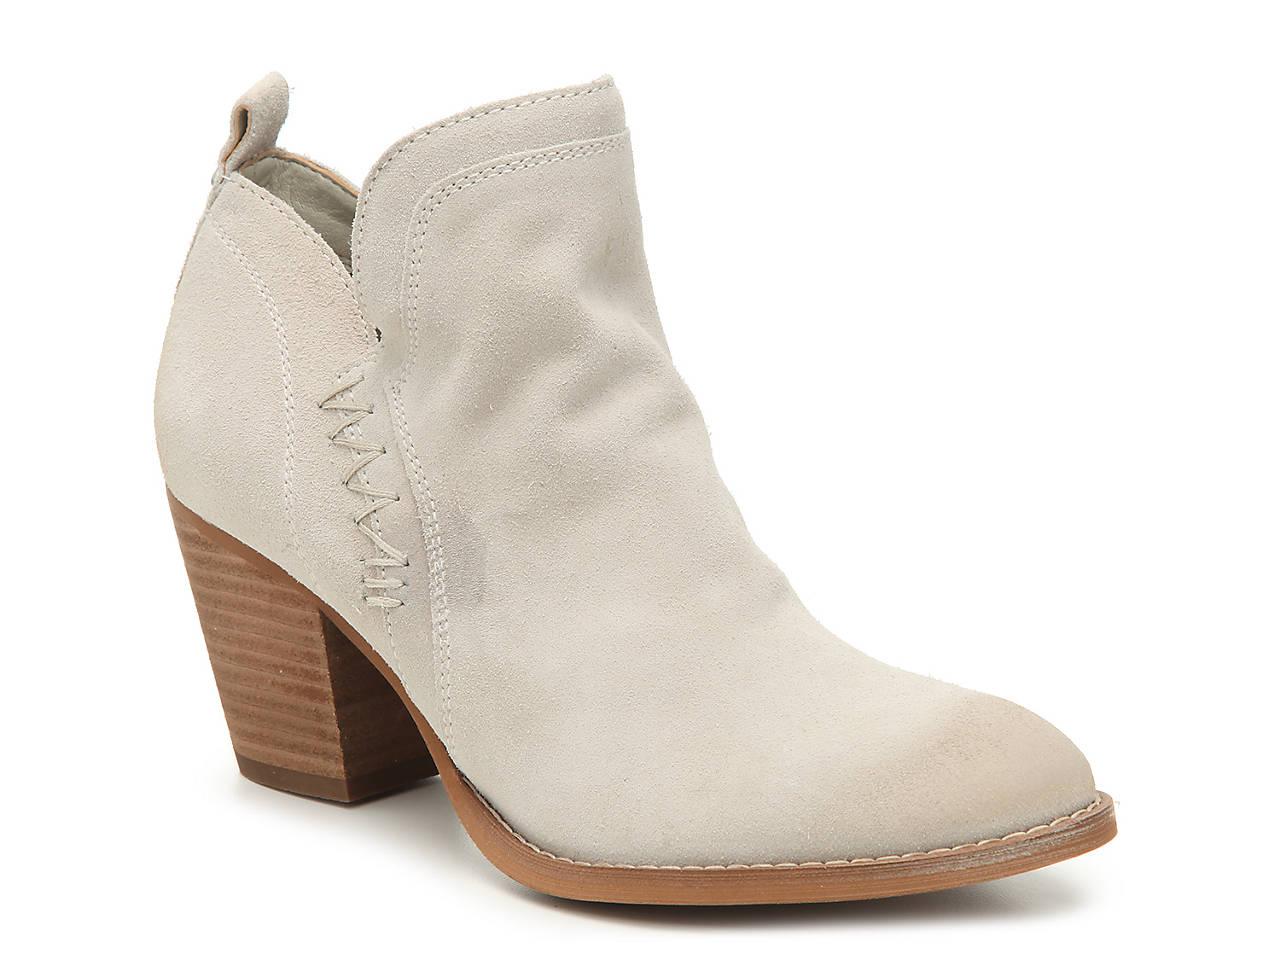 1015aa3ed576 Sam Edelman Mathia Bootie Women s Shoes